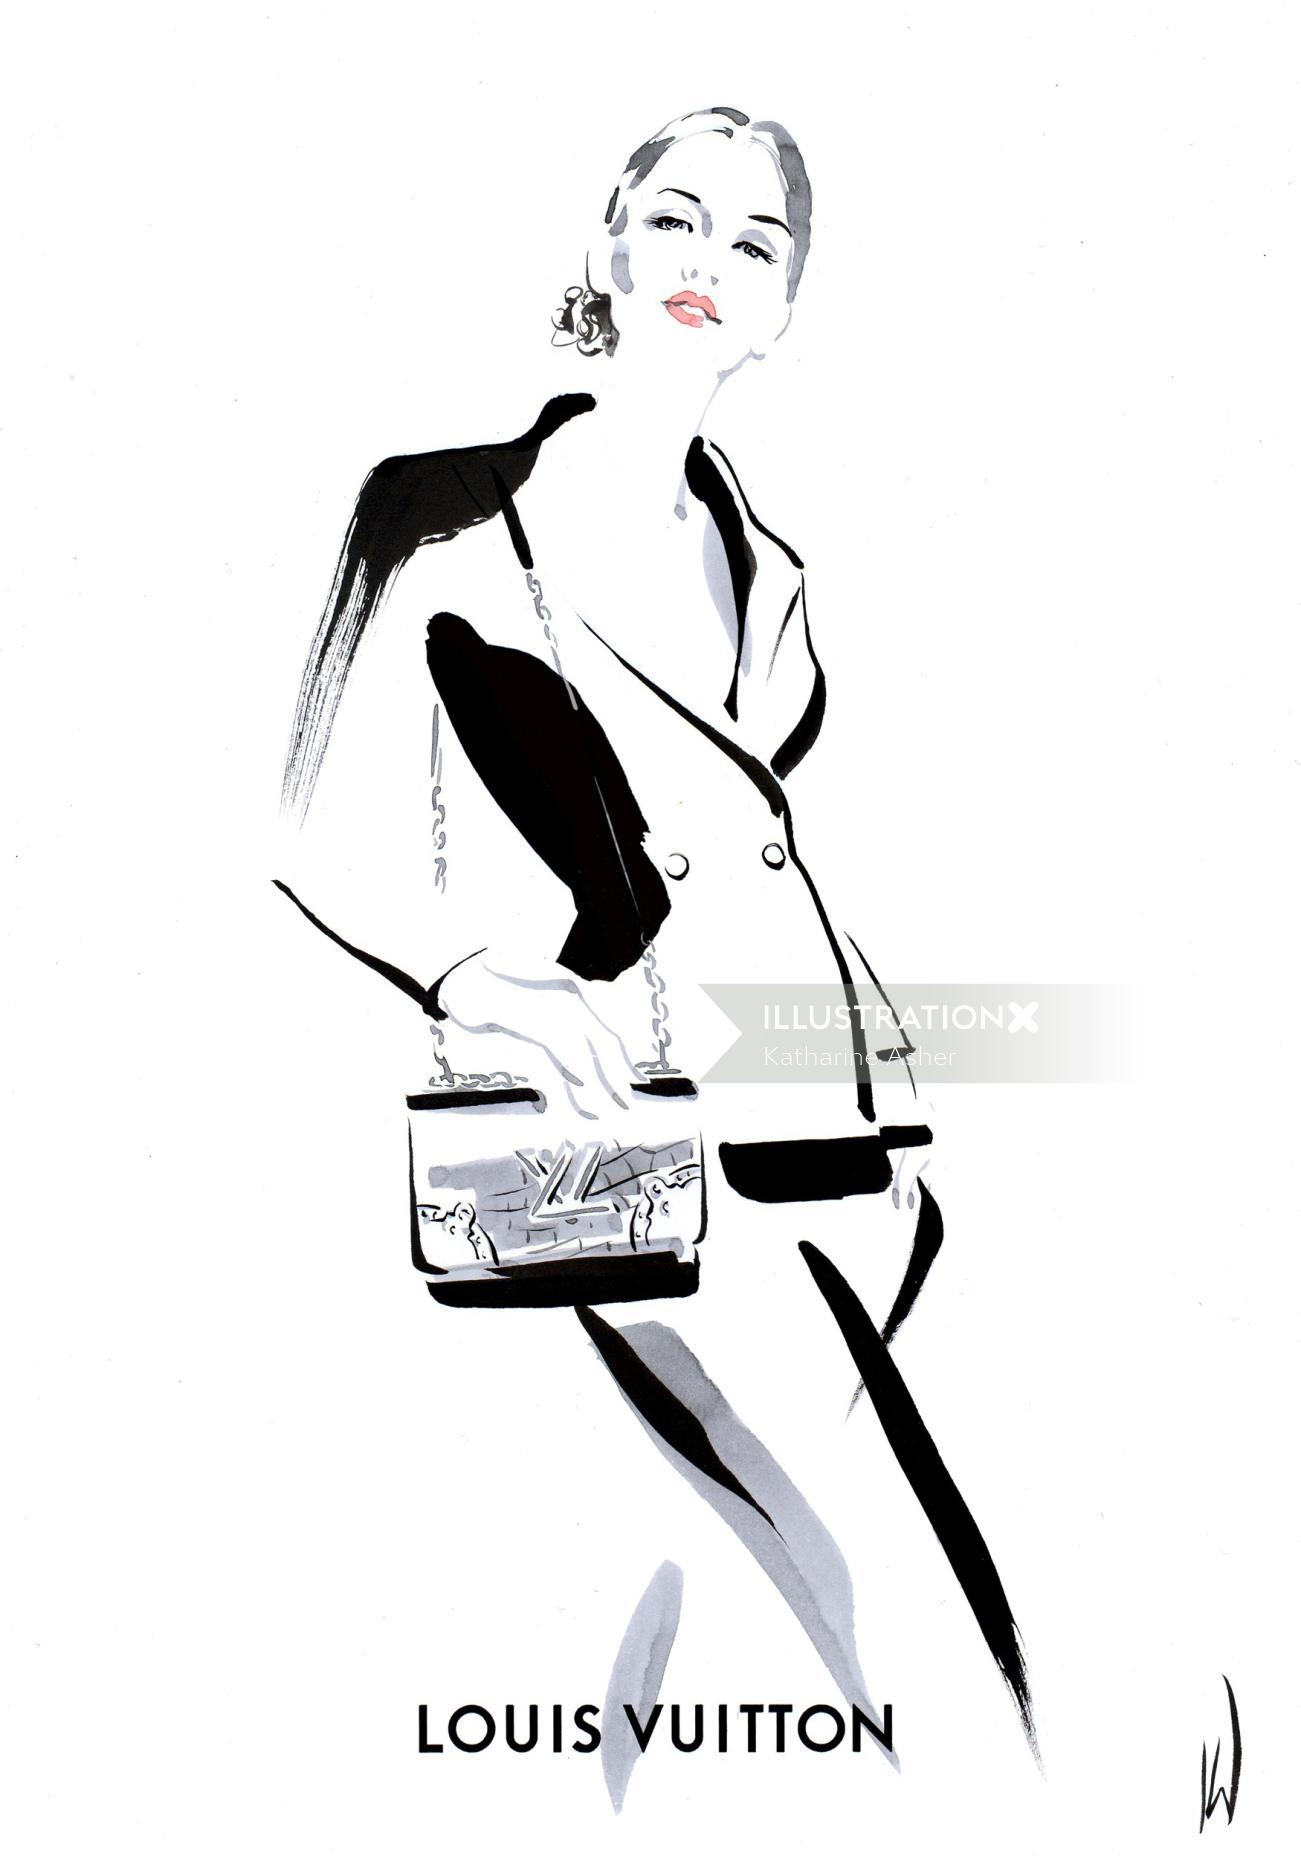 Louis Vuitton fashion illustration